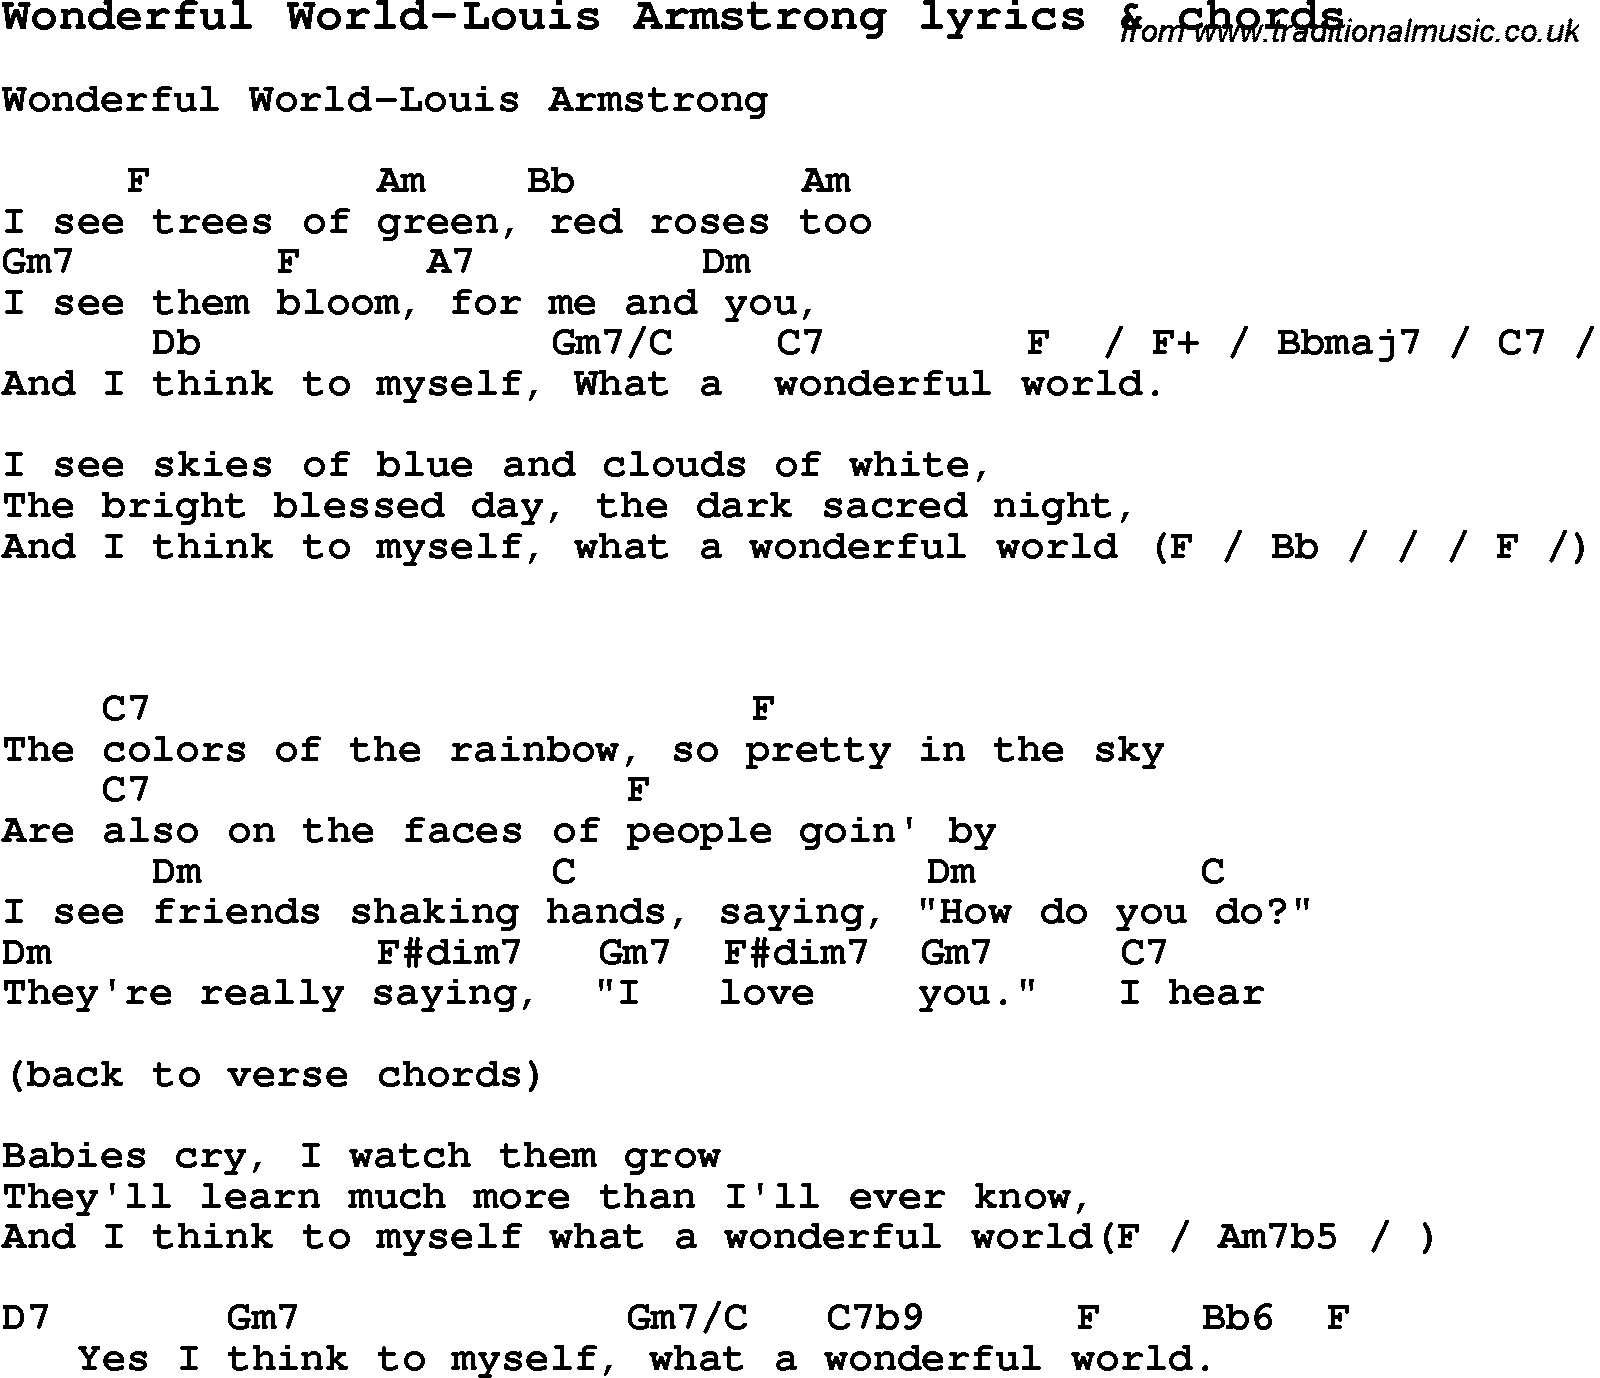 What A Wonderful World Chords Love Song Lyrics Forwonderful World Louis Armstrong With Chords